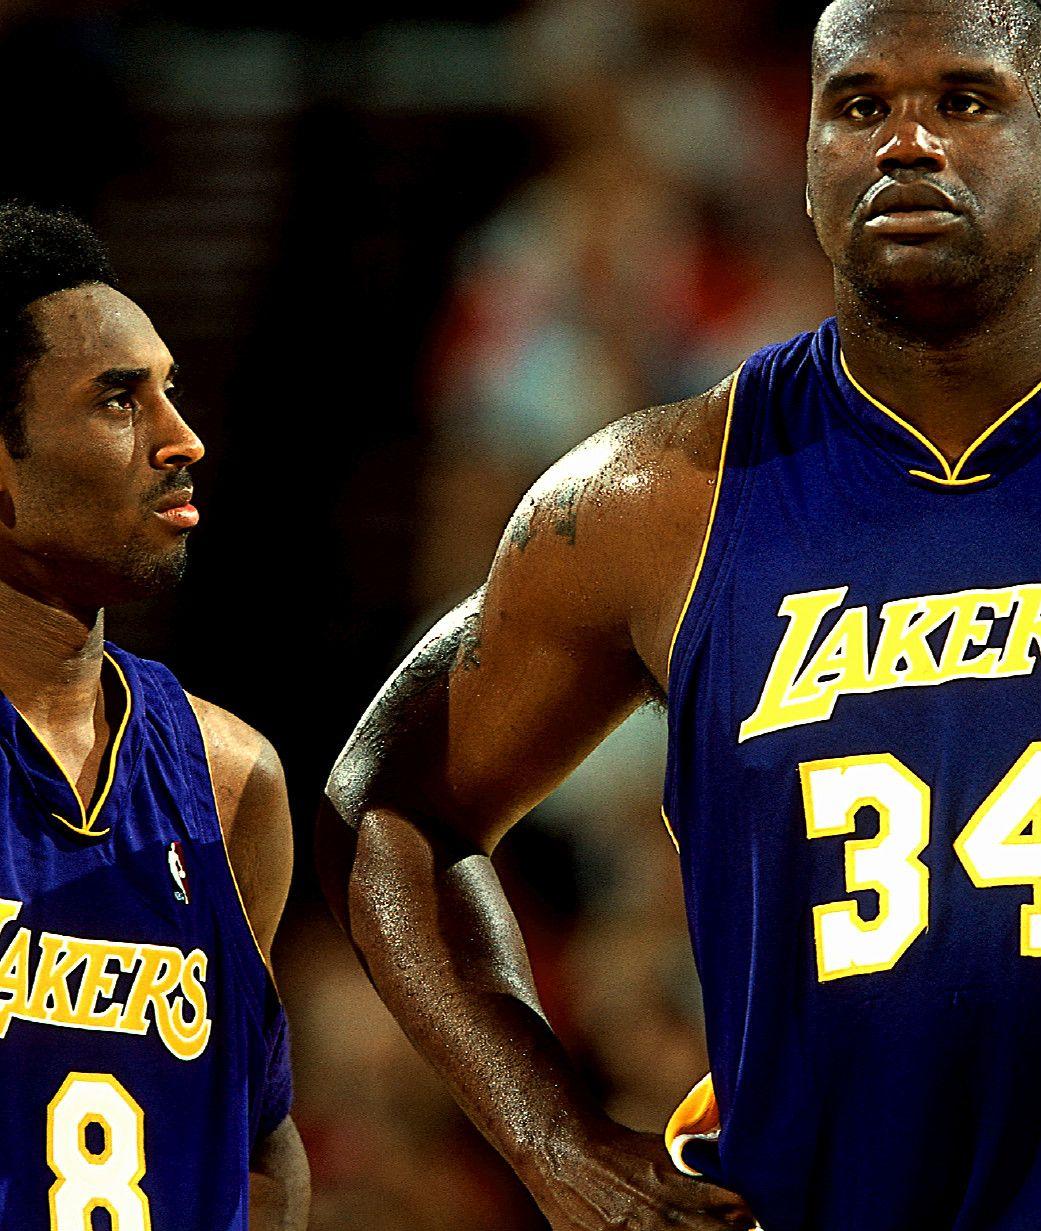 Kobe & Shaq Kobe lebron, Sports basketball, La lakers